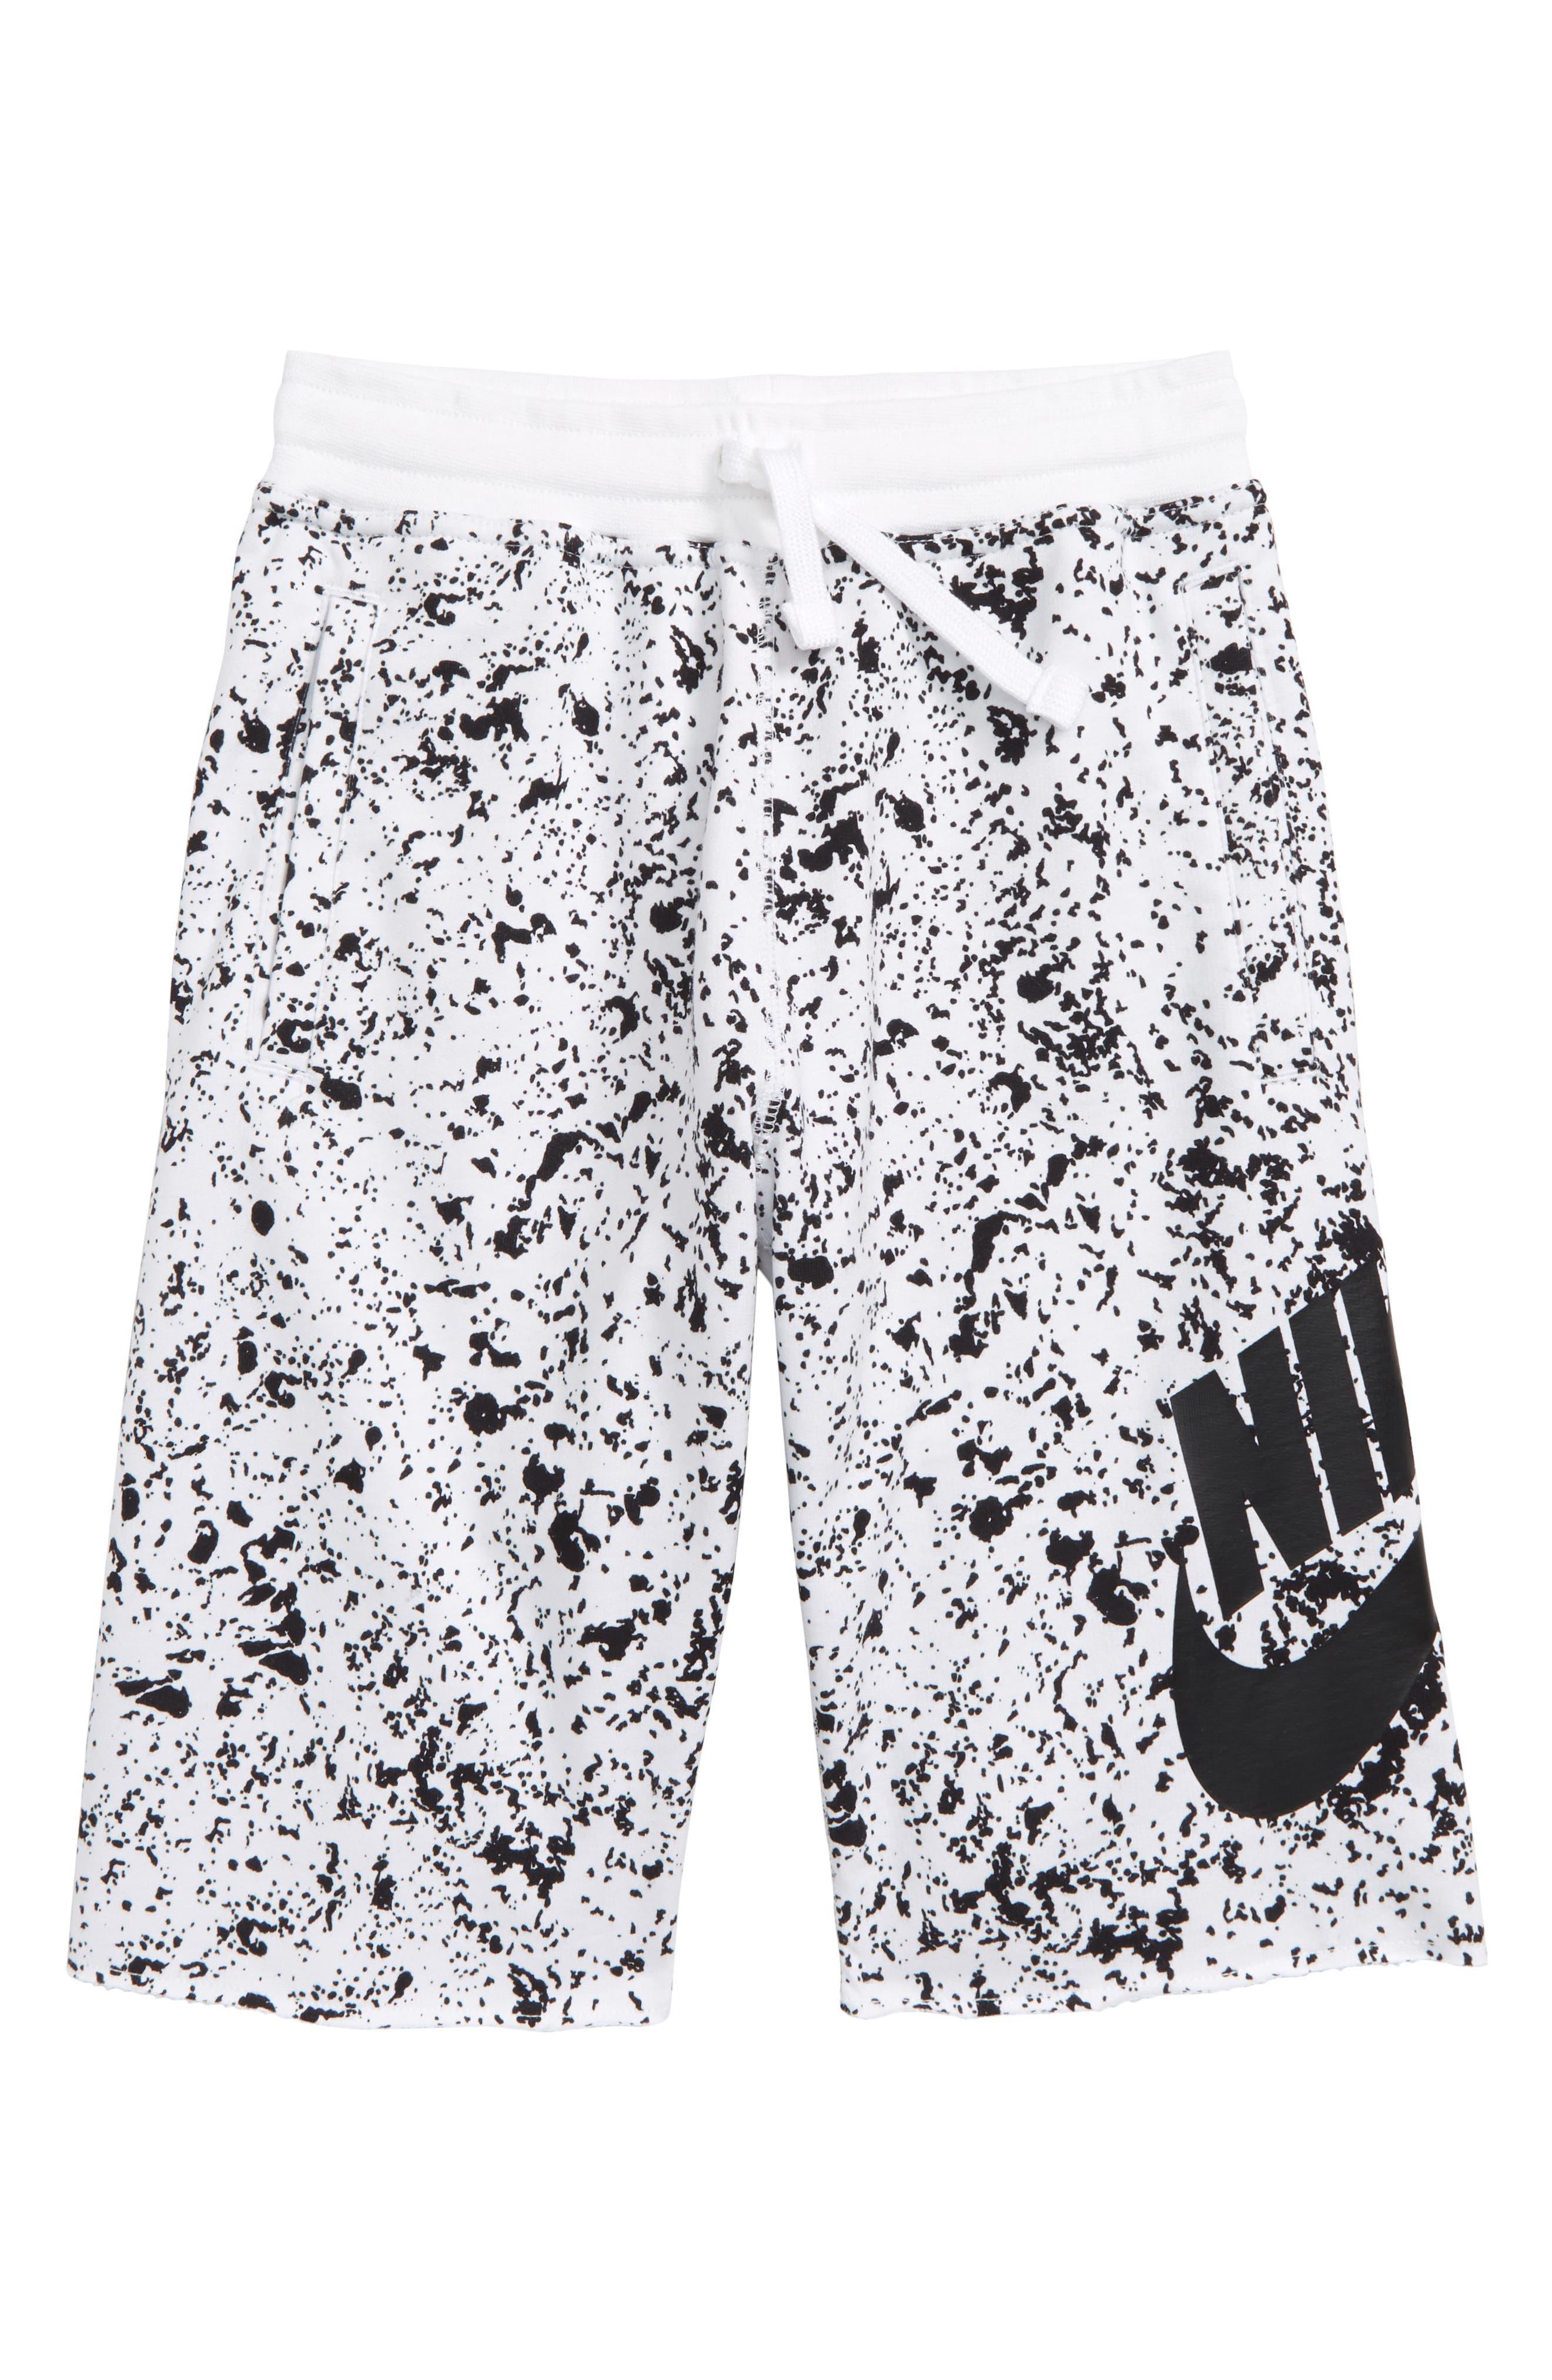 Sportswear Alumni Shorts,                             Main thumbnail 2, color,